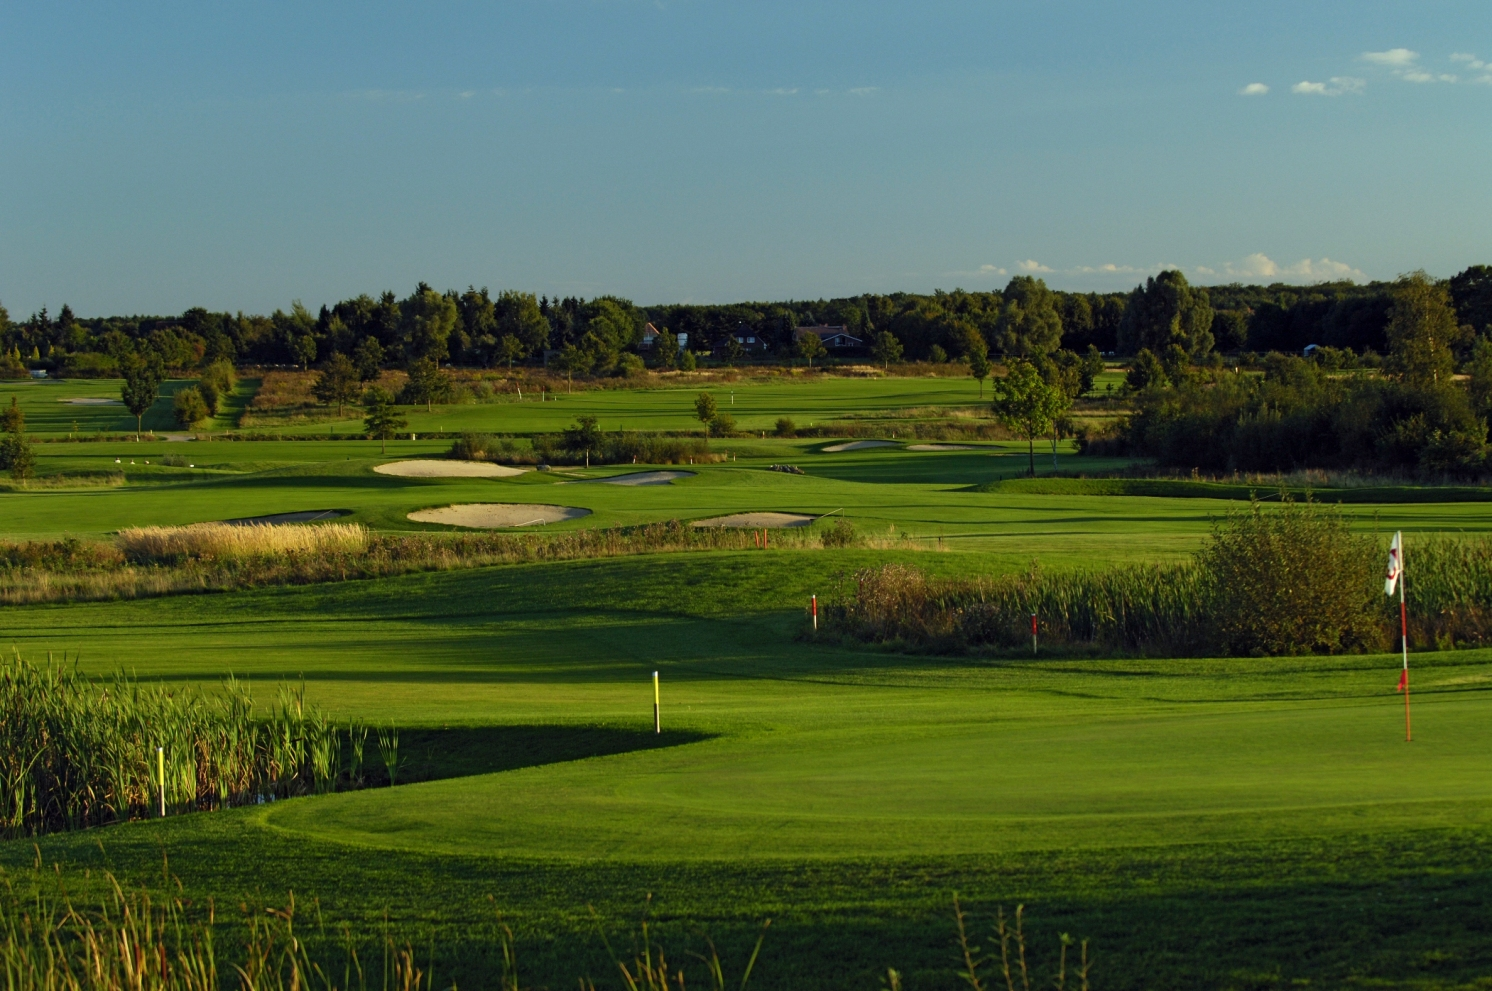 golfclub golf country club brunstorf in 21524. Black Bedroom Furniture Sets. Home Design Ideas